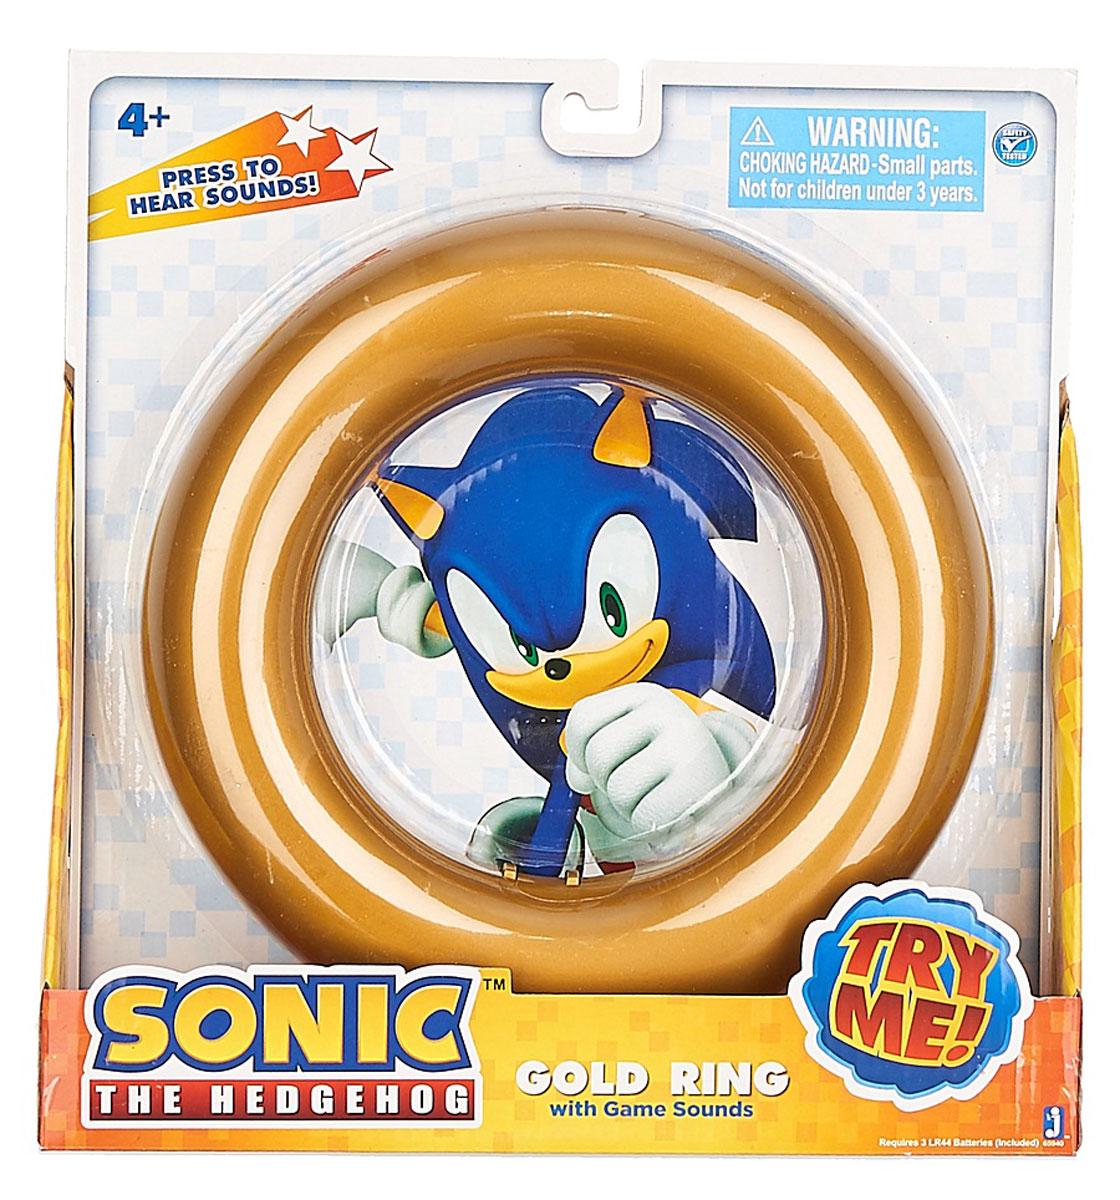 Sonic Музыкальная игрушка Gold Ring